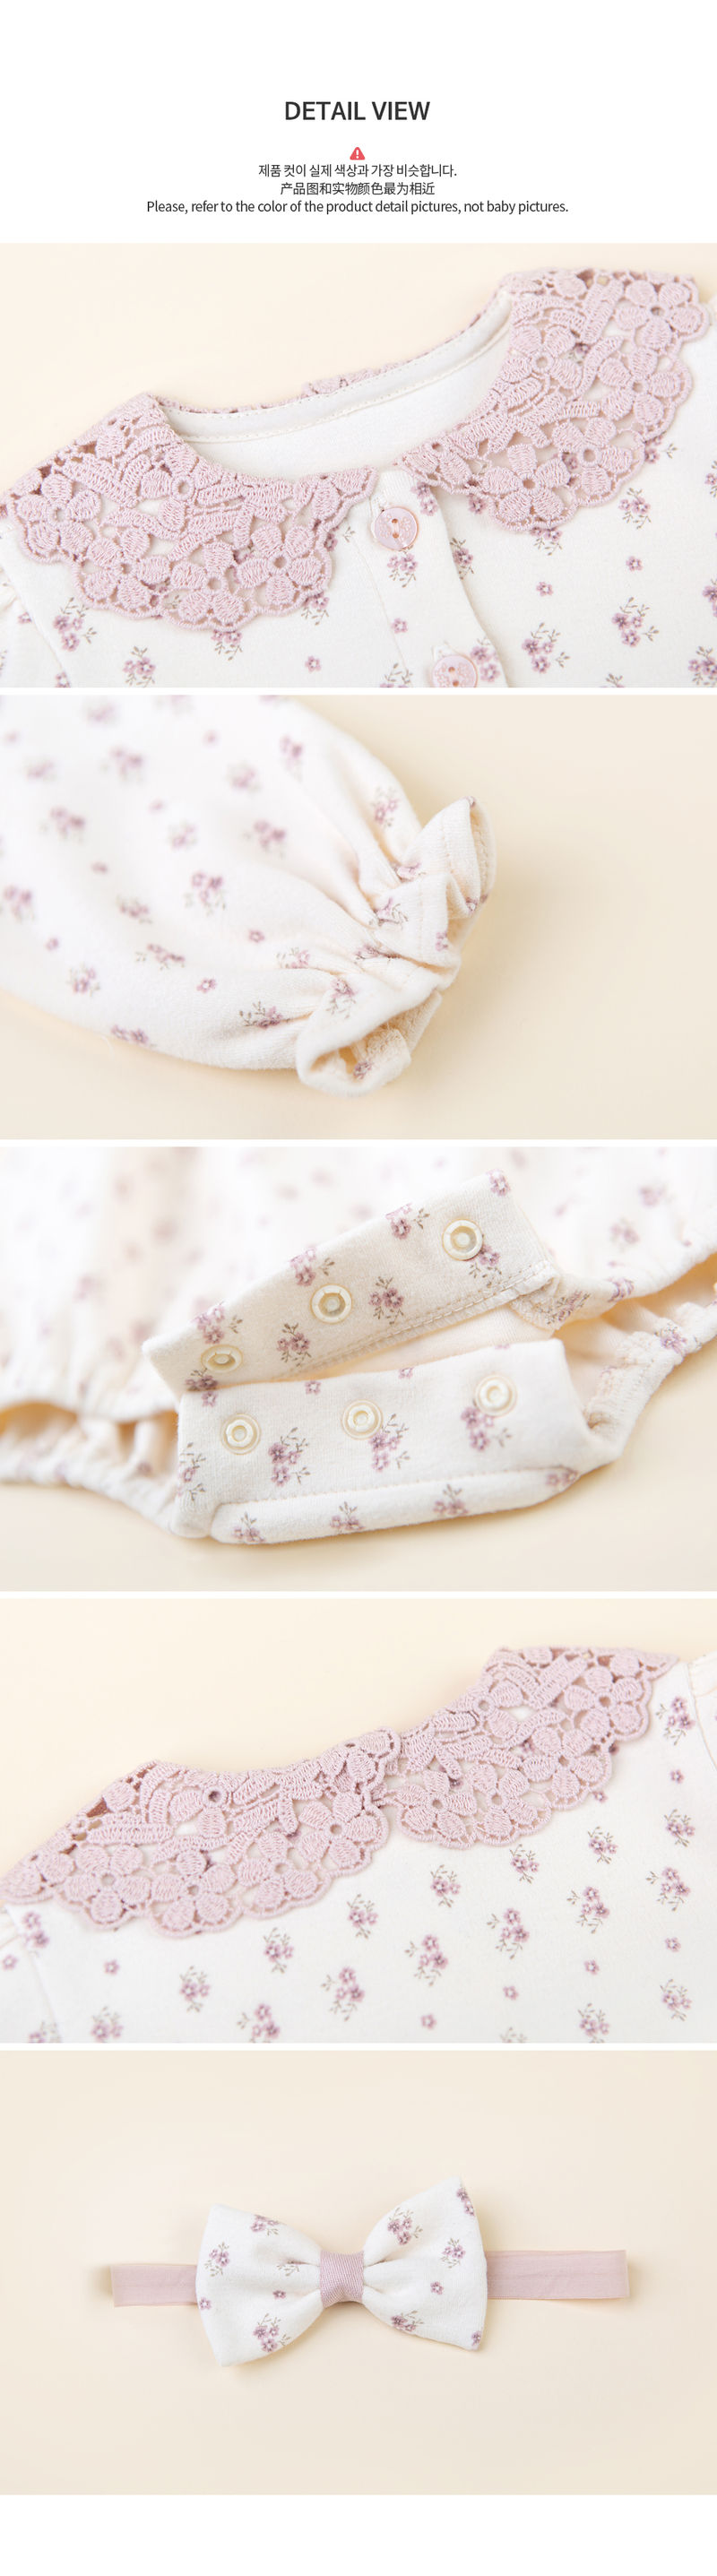 HAPPY PRINCE - Korean Children Fashion - #Kfashion4kids - Vane Body Suit + Hairband - 7